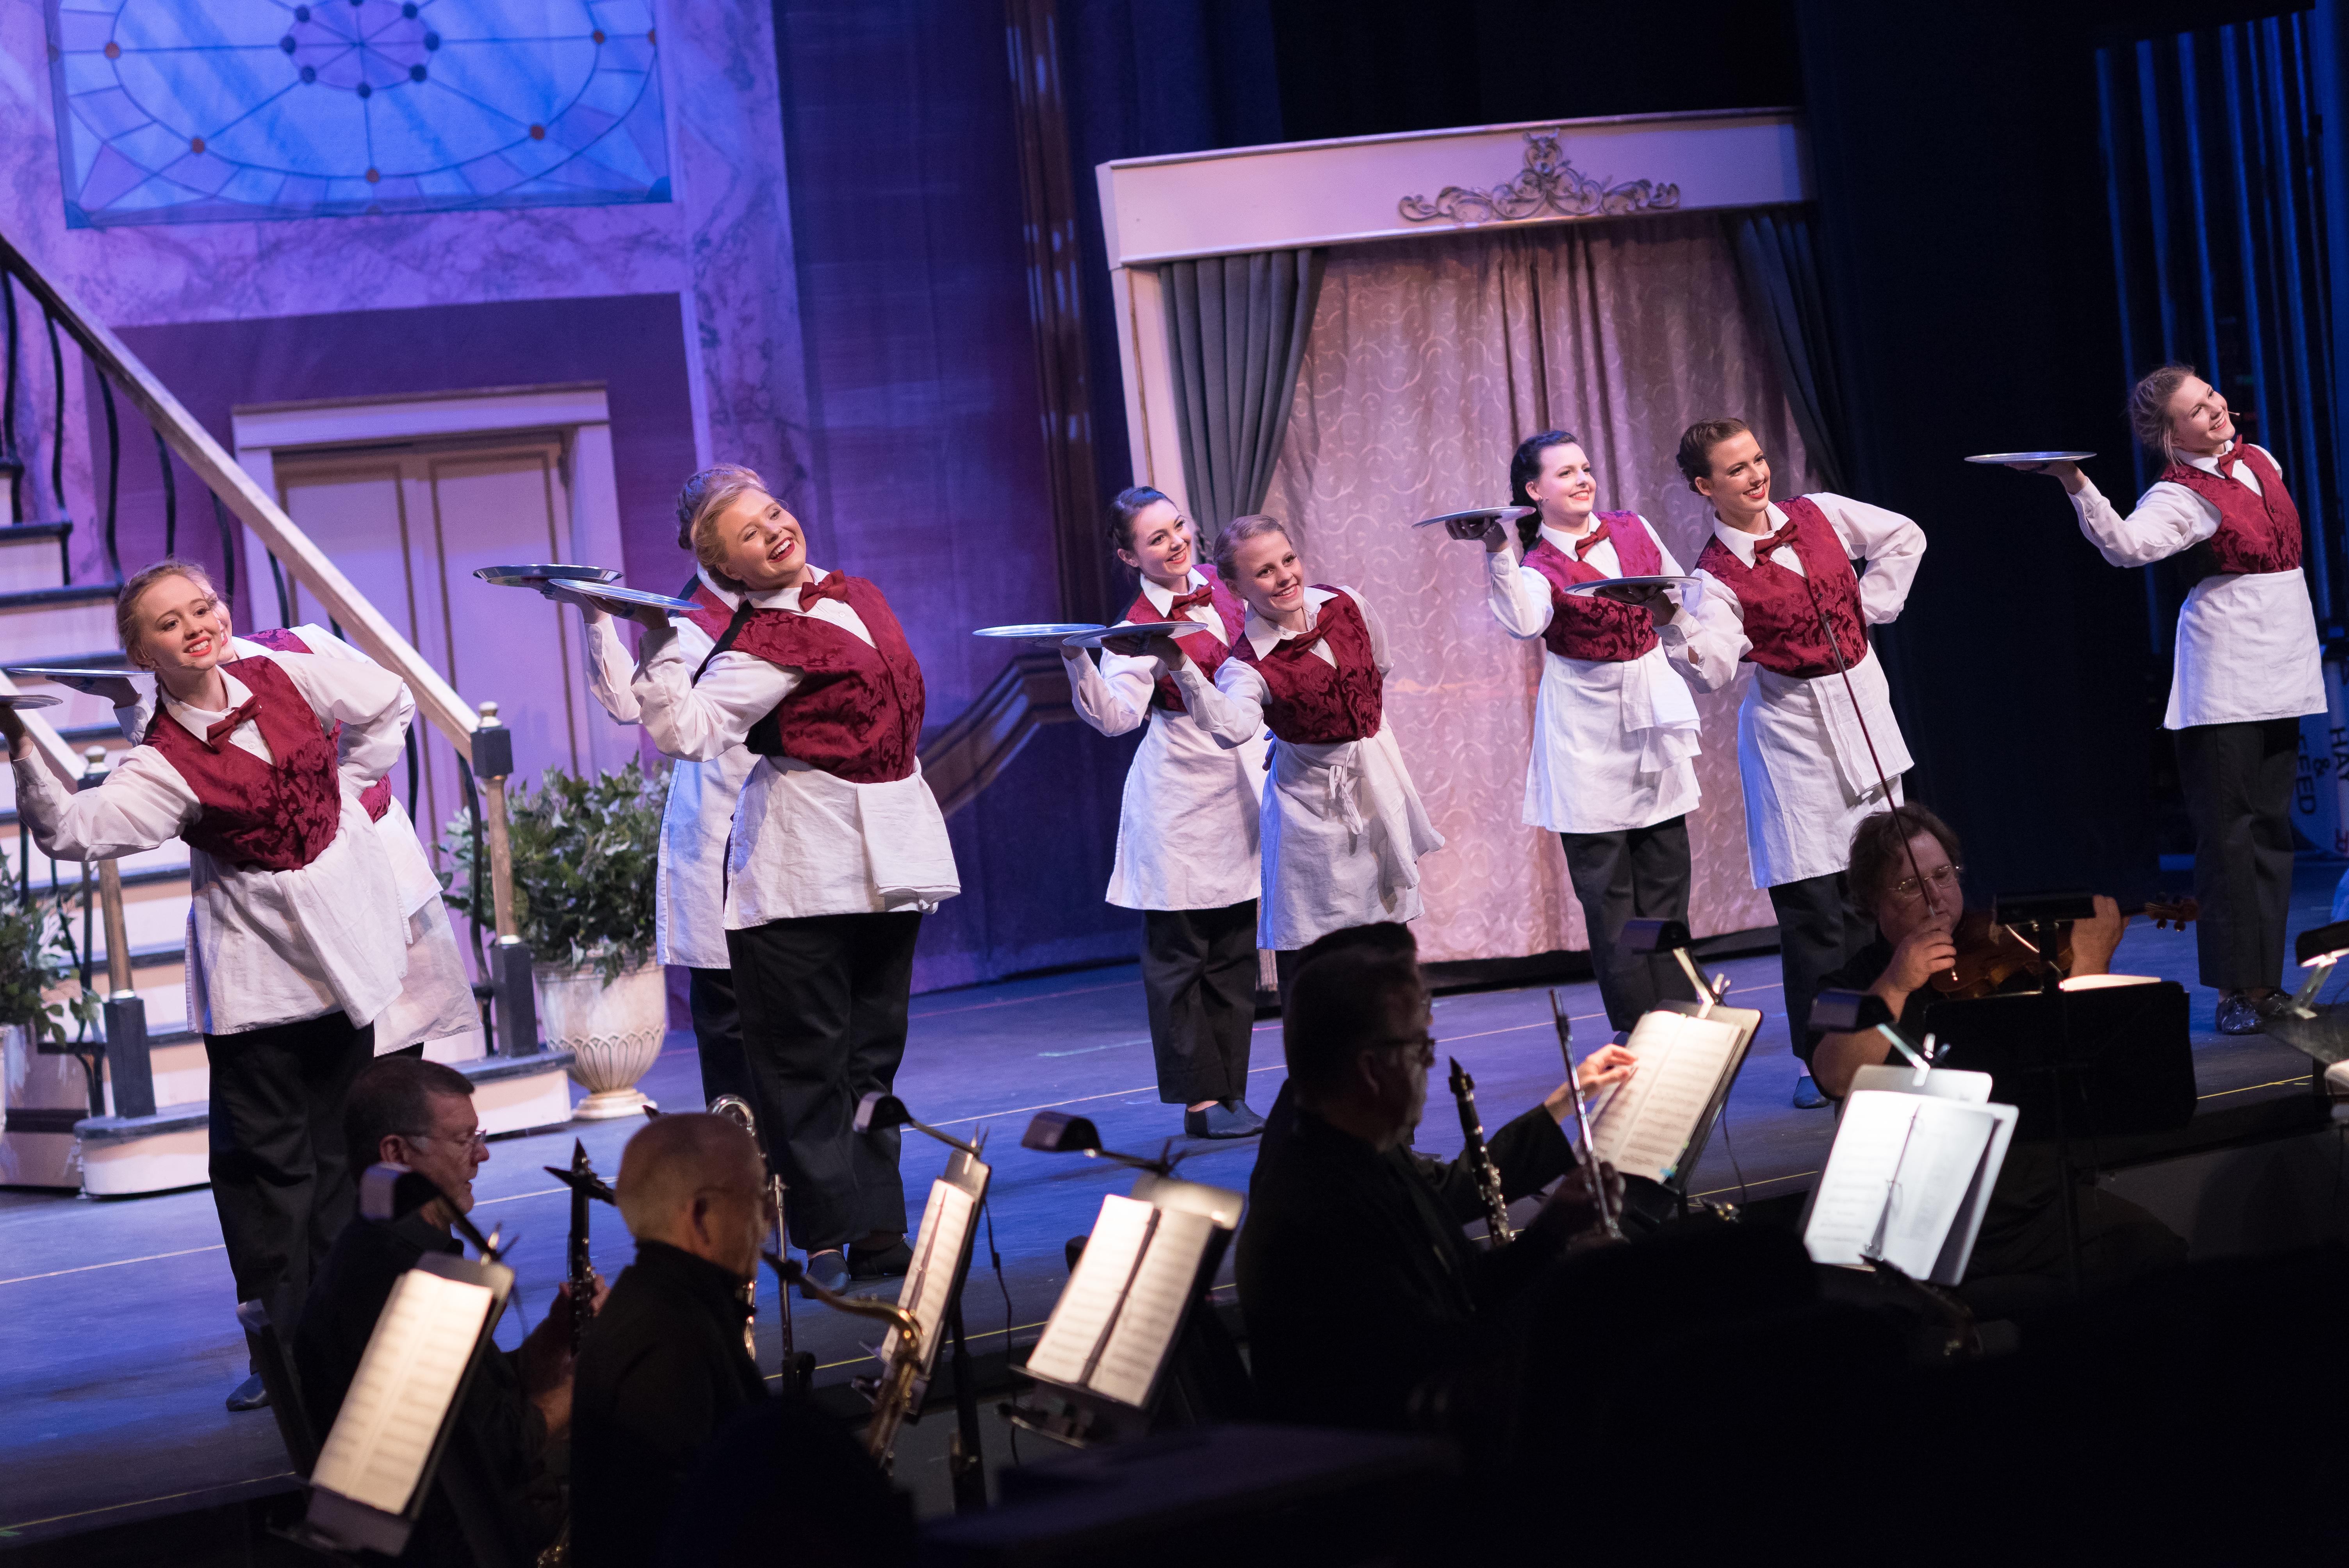 Theatre - Prestonwood Christian Academy